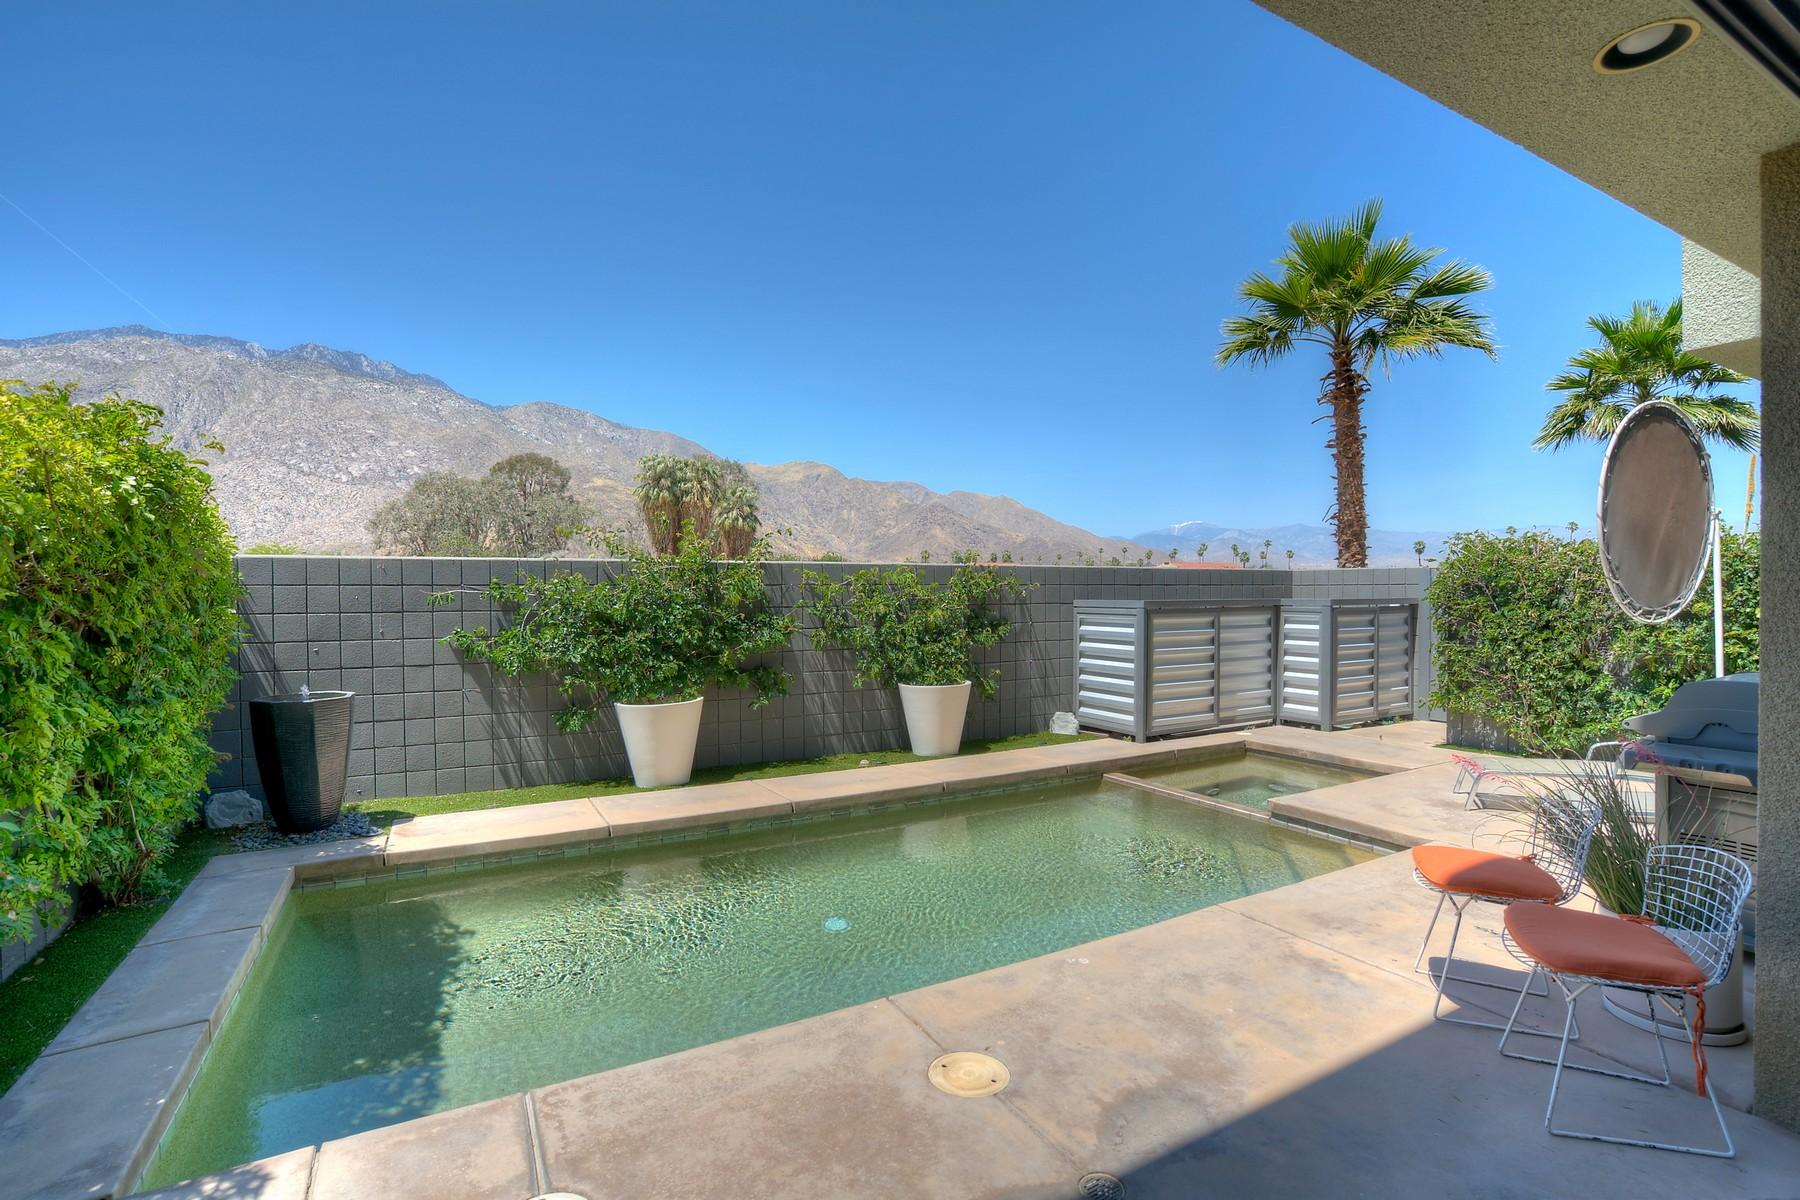 Condominium for Sale at 1458 E Baristo Road 1458 East Baristo Road Palm Springs, California, 92262 United States